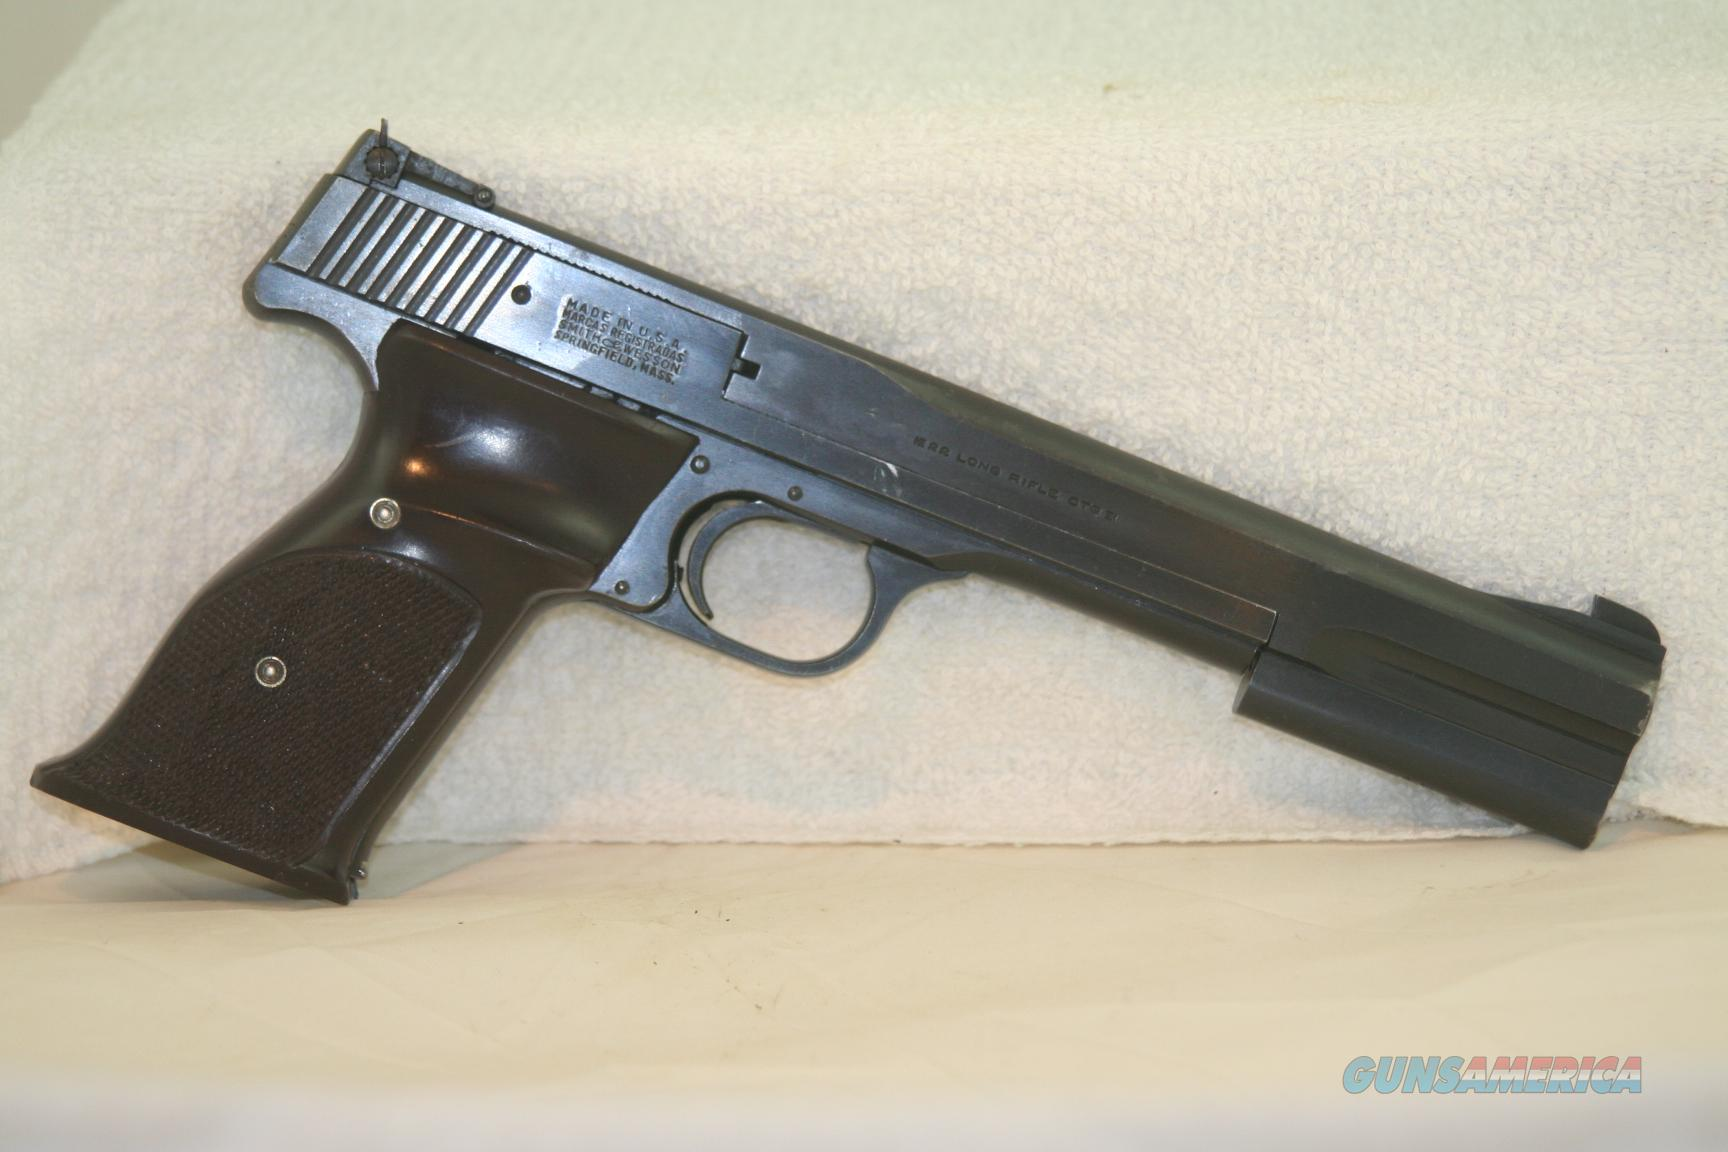 Smith & Wesson Model 46, 22 LR, VERY RARE MODEL